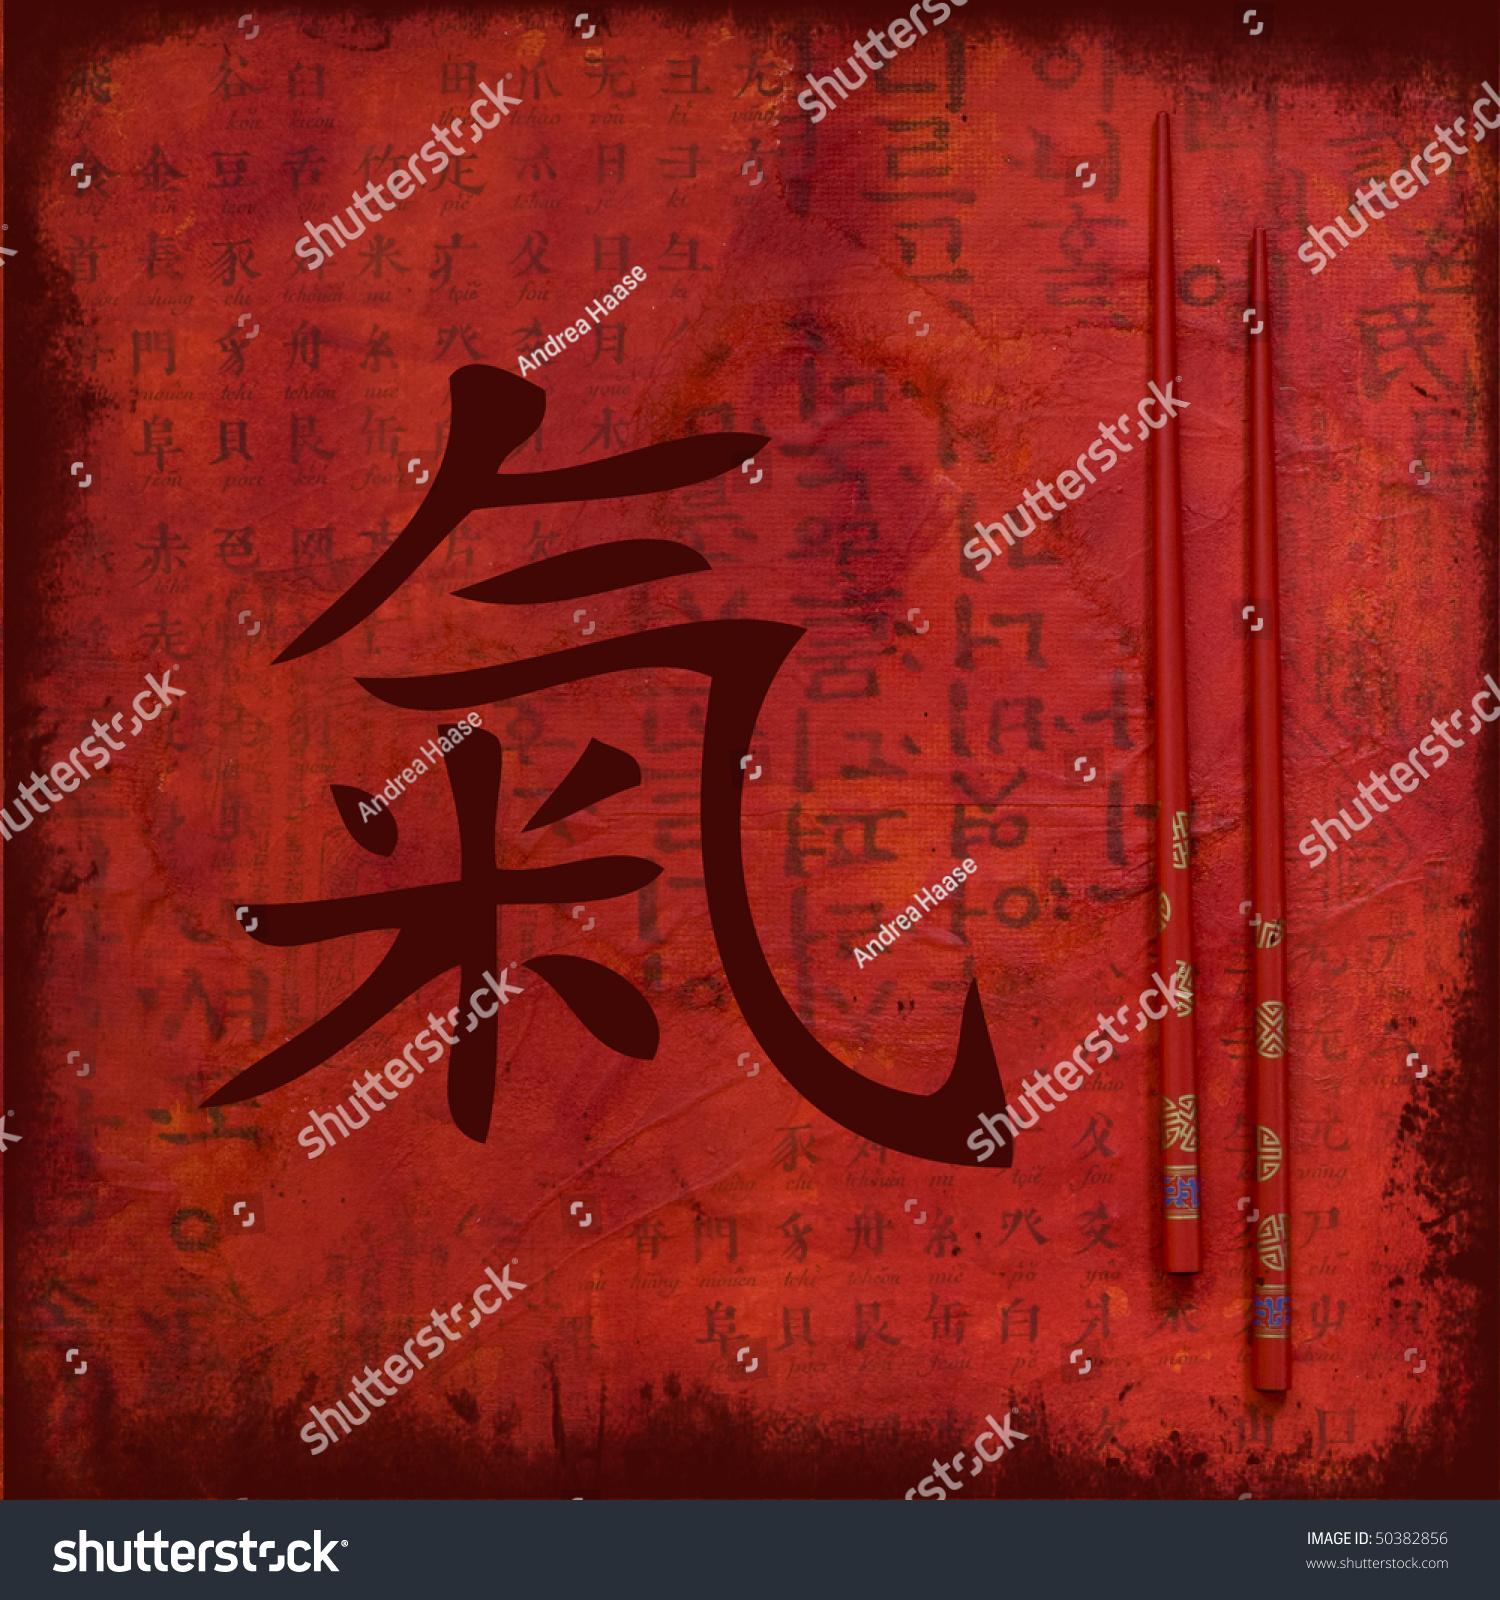 Artwork Chinese Symbol Chi Art Digital Stock Illustration 50382856